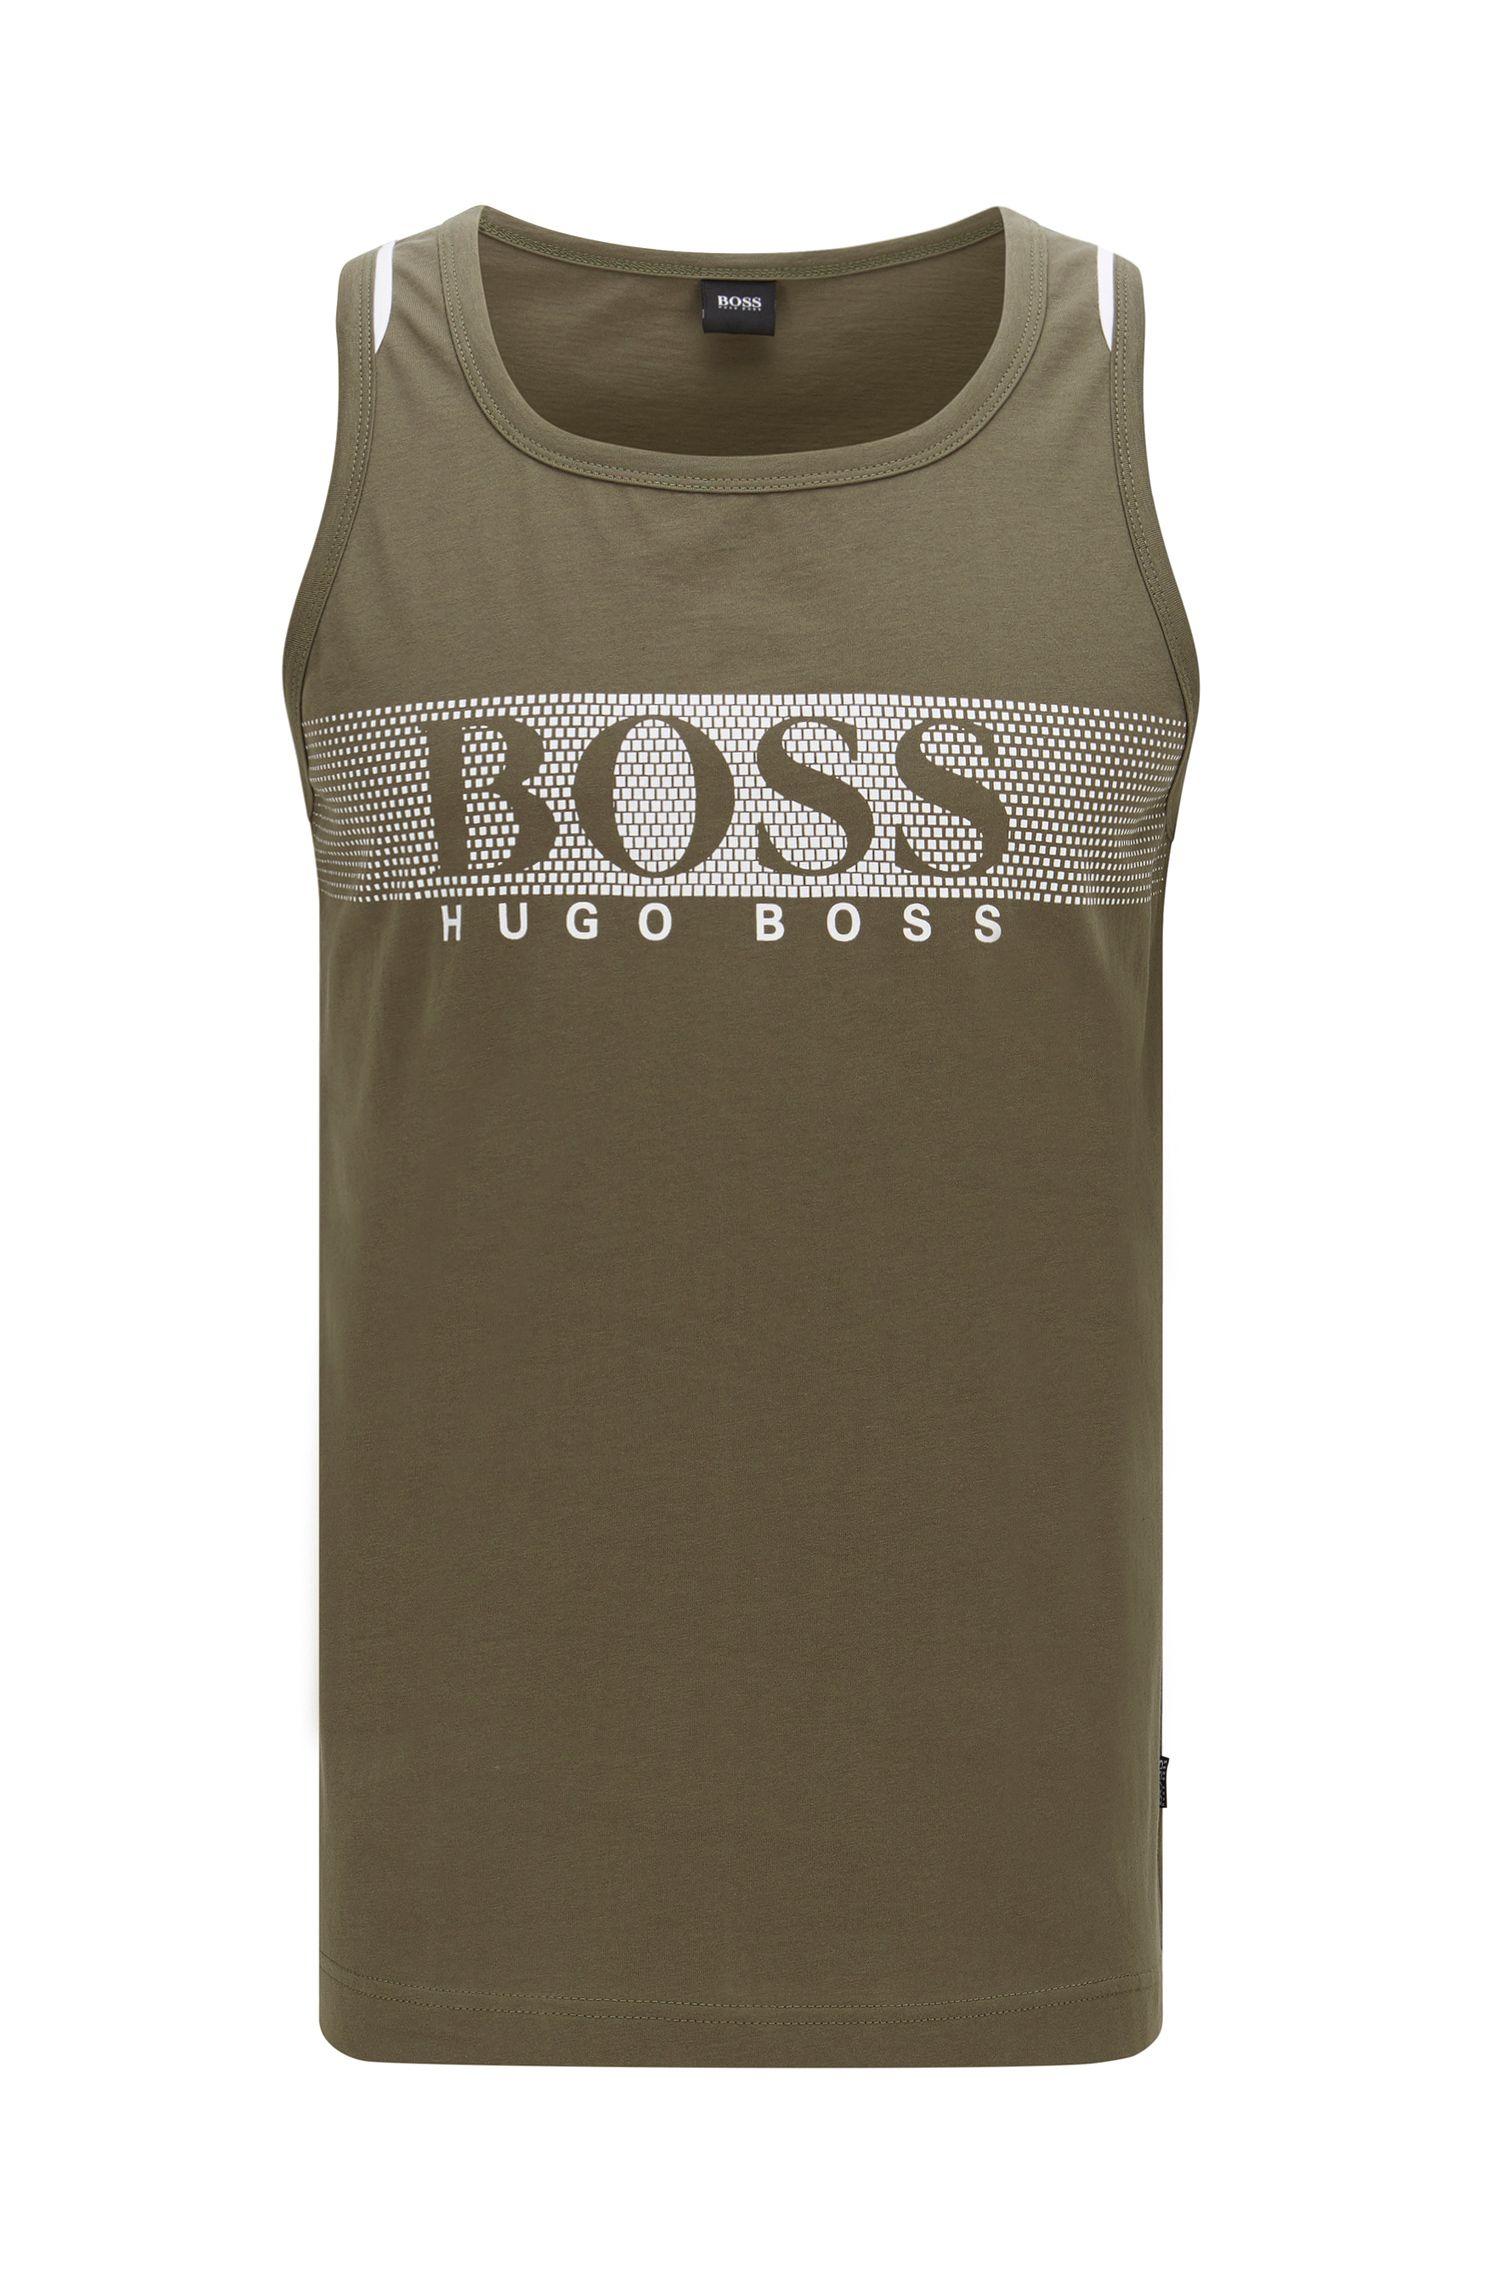 Cotton Jersey Tank Top with Logo Print | Beach Tank Top